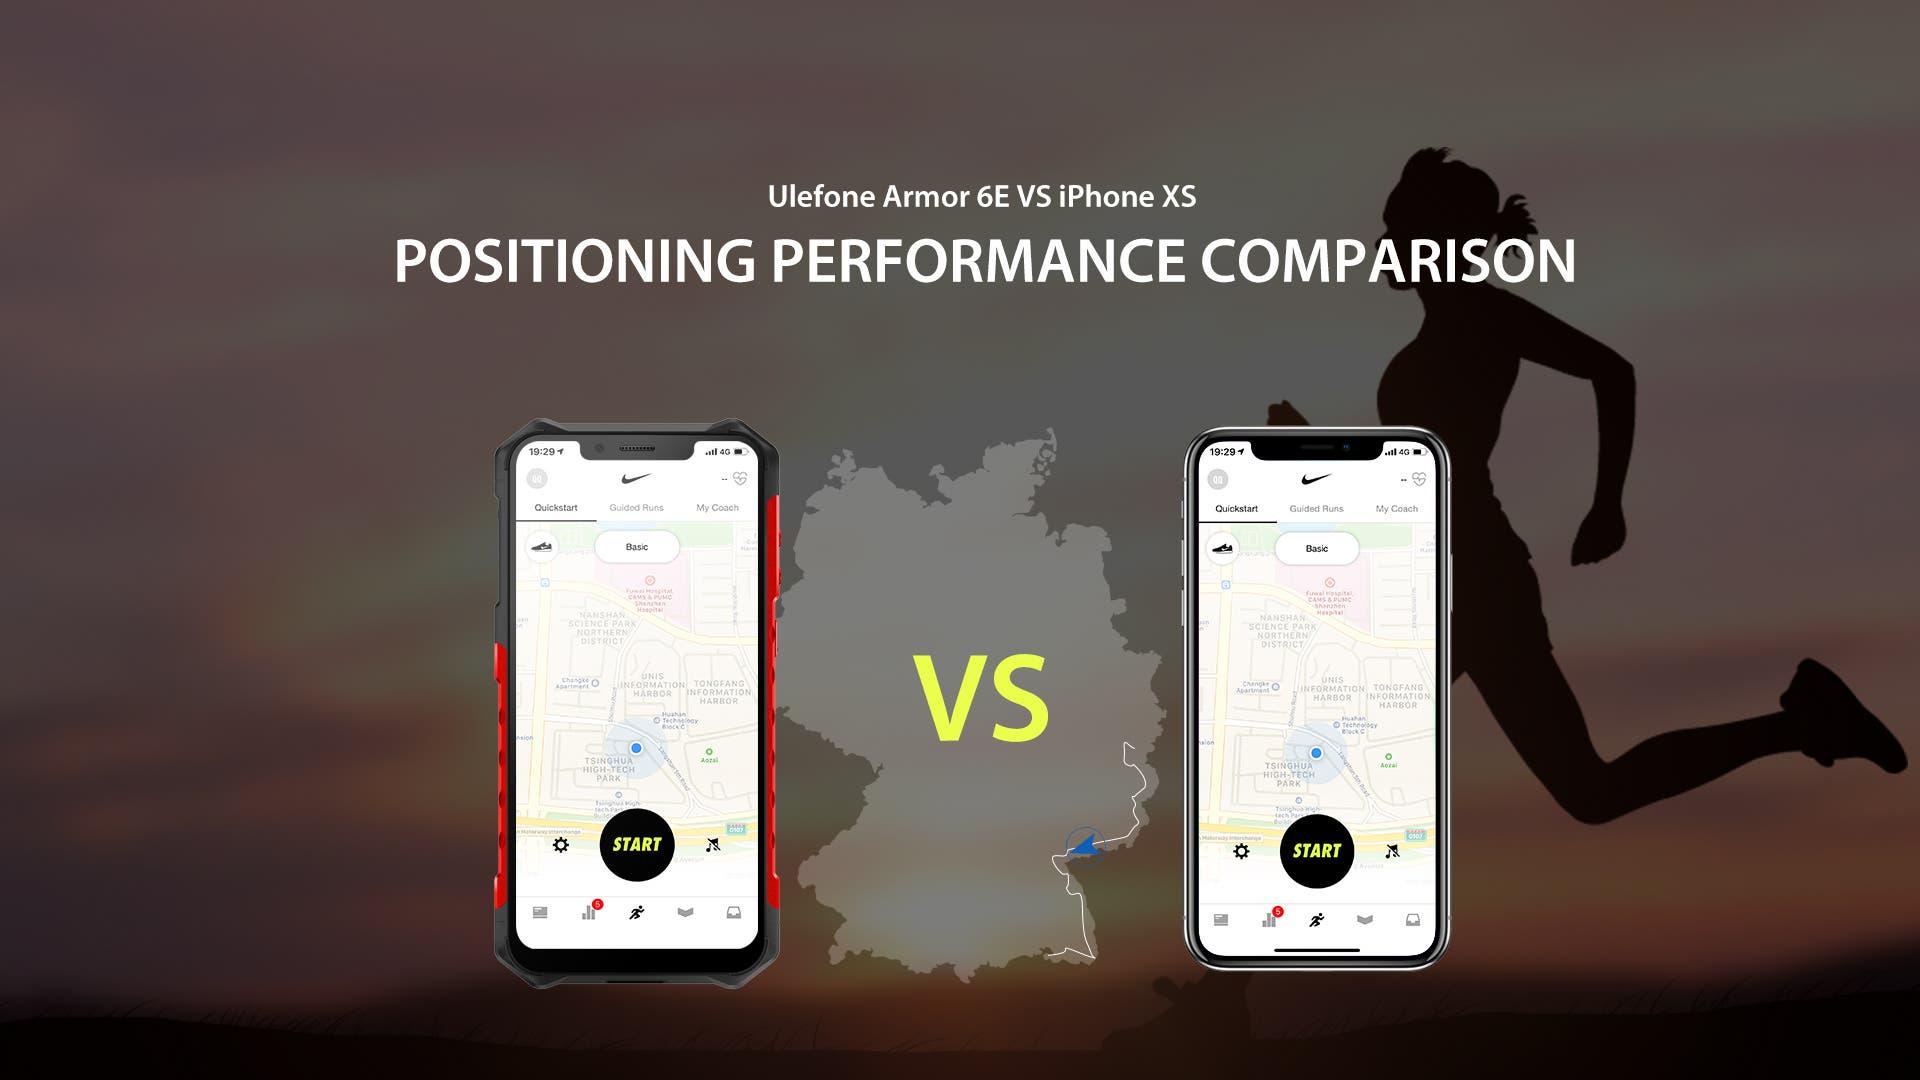 Ulefone Armor 6E VS iPhone XS